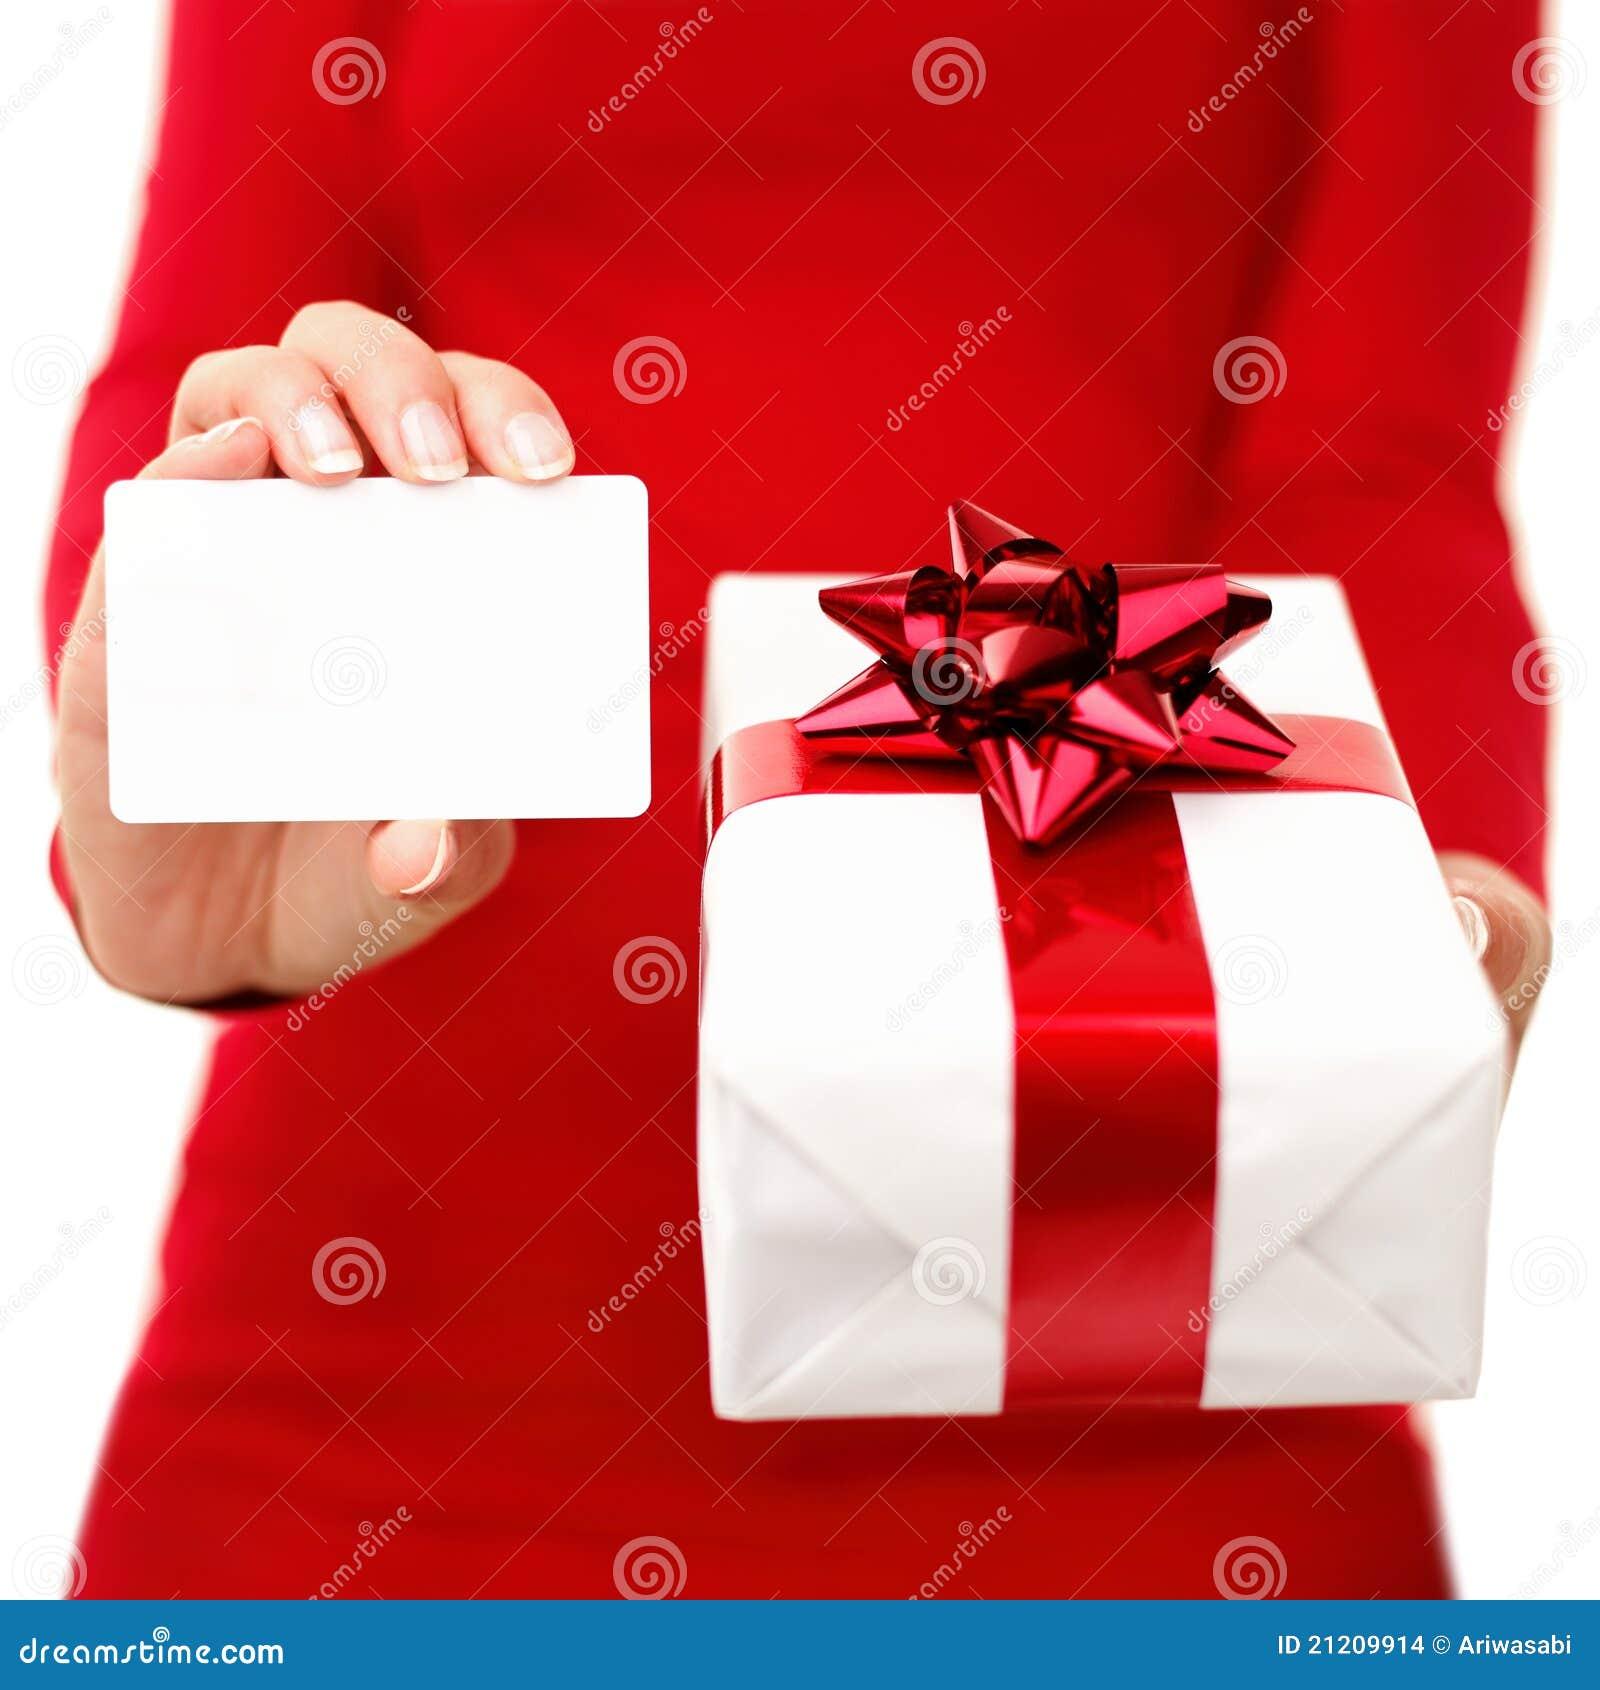 Christmas Present And Gift Card Stock Photo - Image of birthday ...